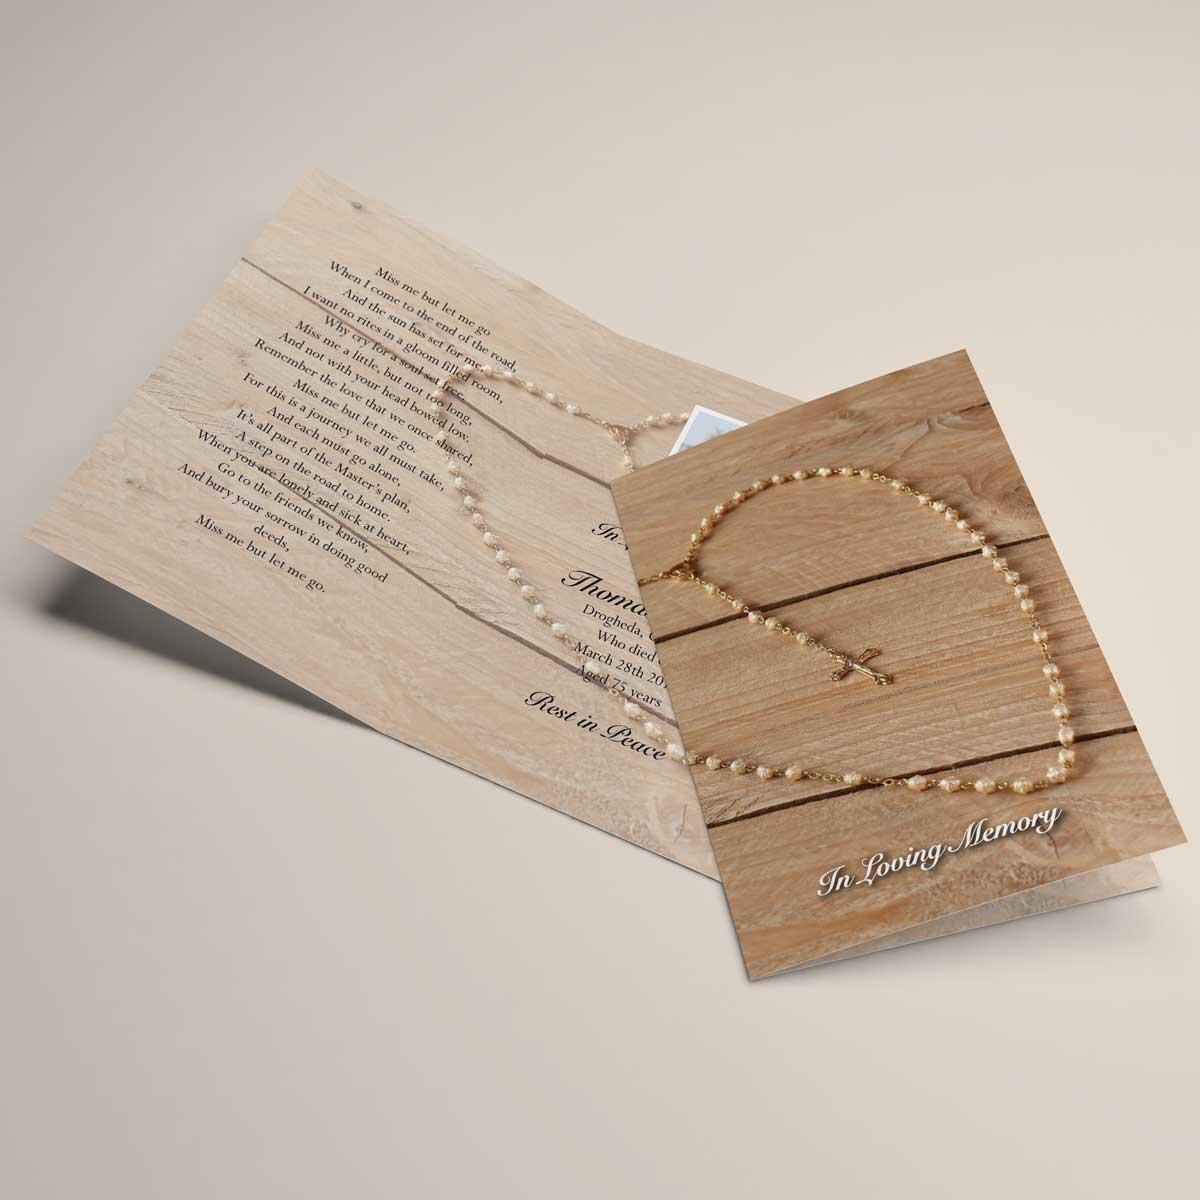 Religious inspired memorial card design - rosary beads